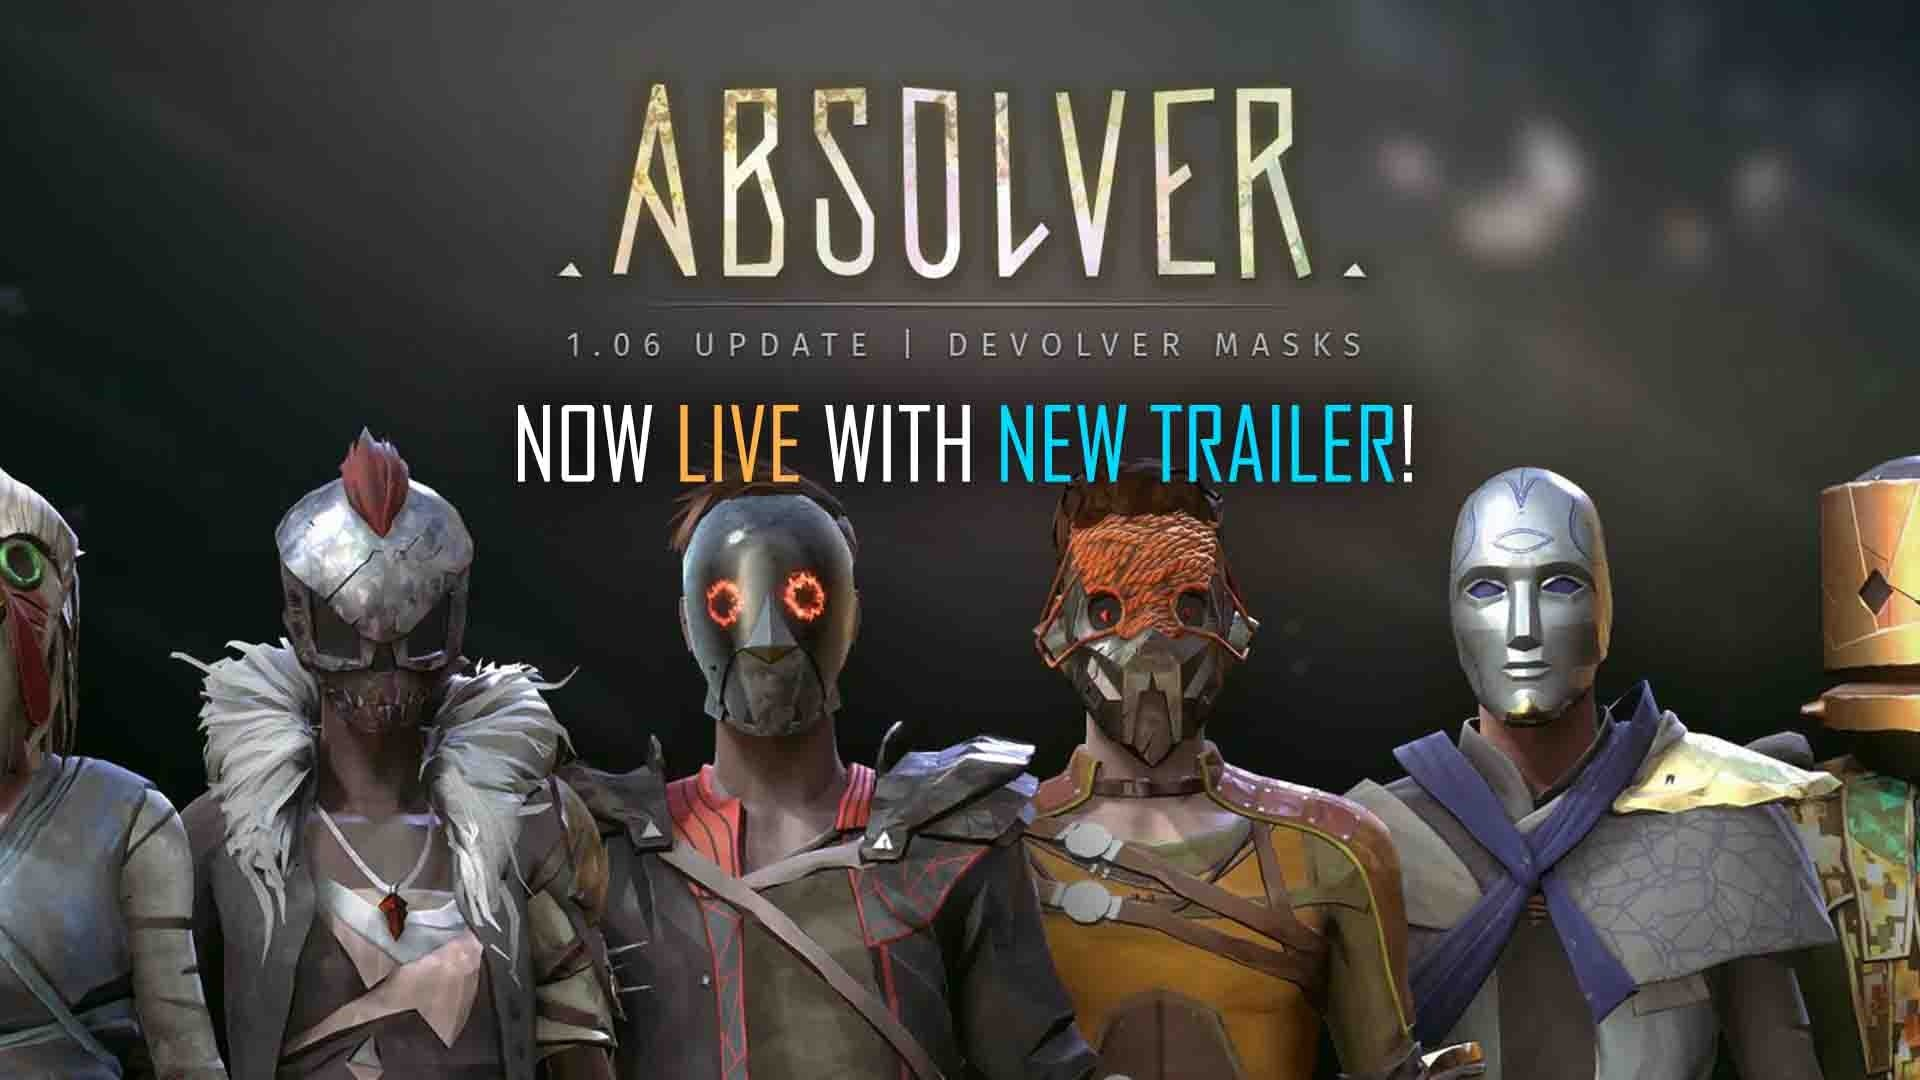 absolver-update-patch-106-devolver-masks-trailer-sloclap-online-martial-arts-rpg